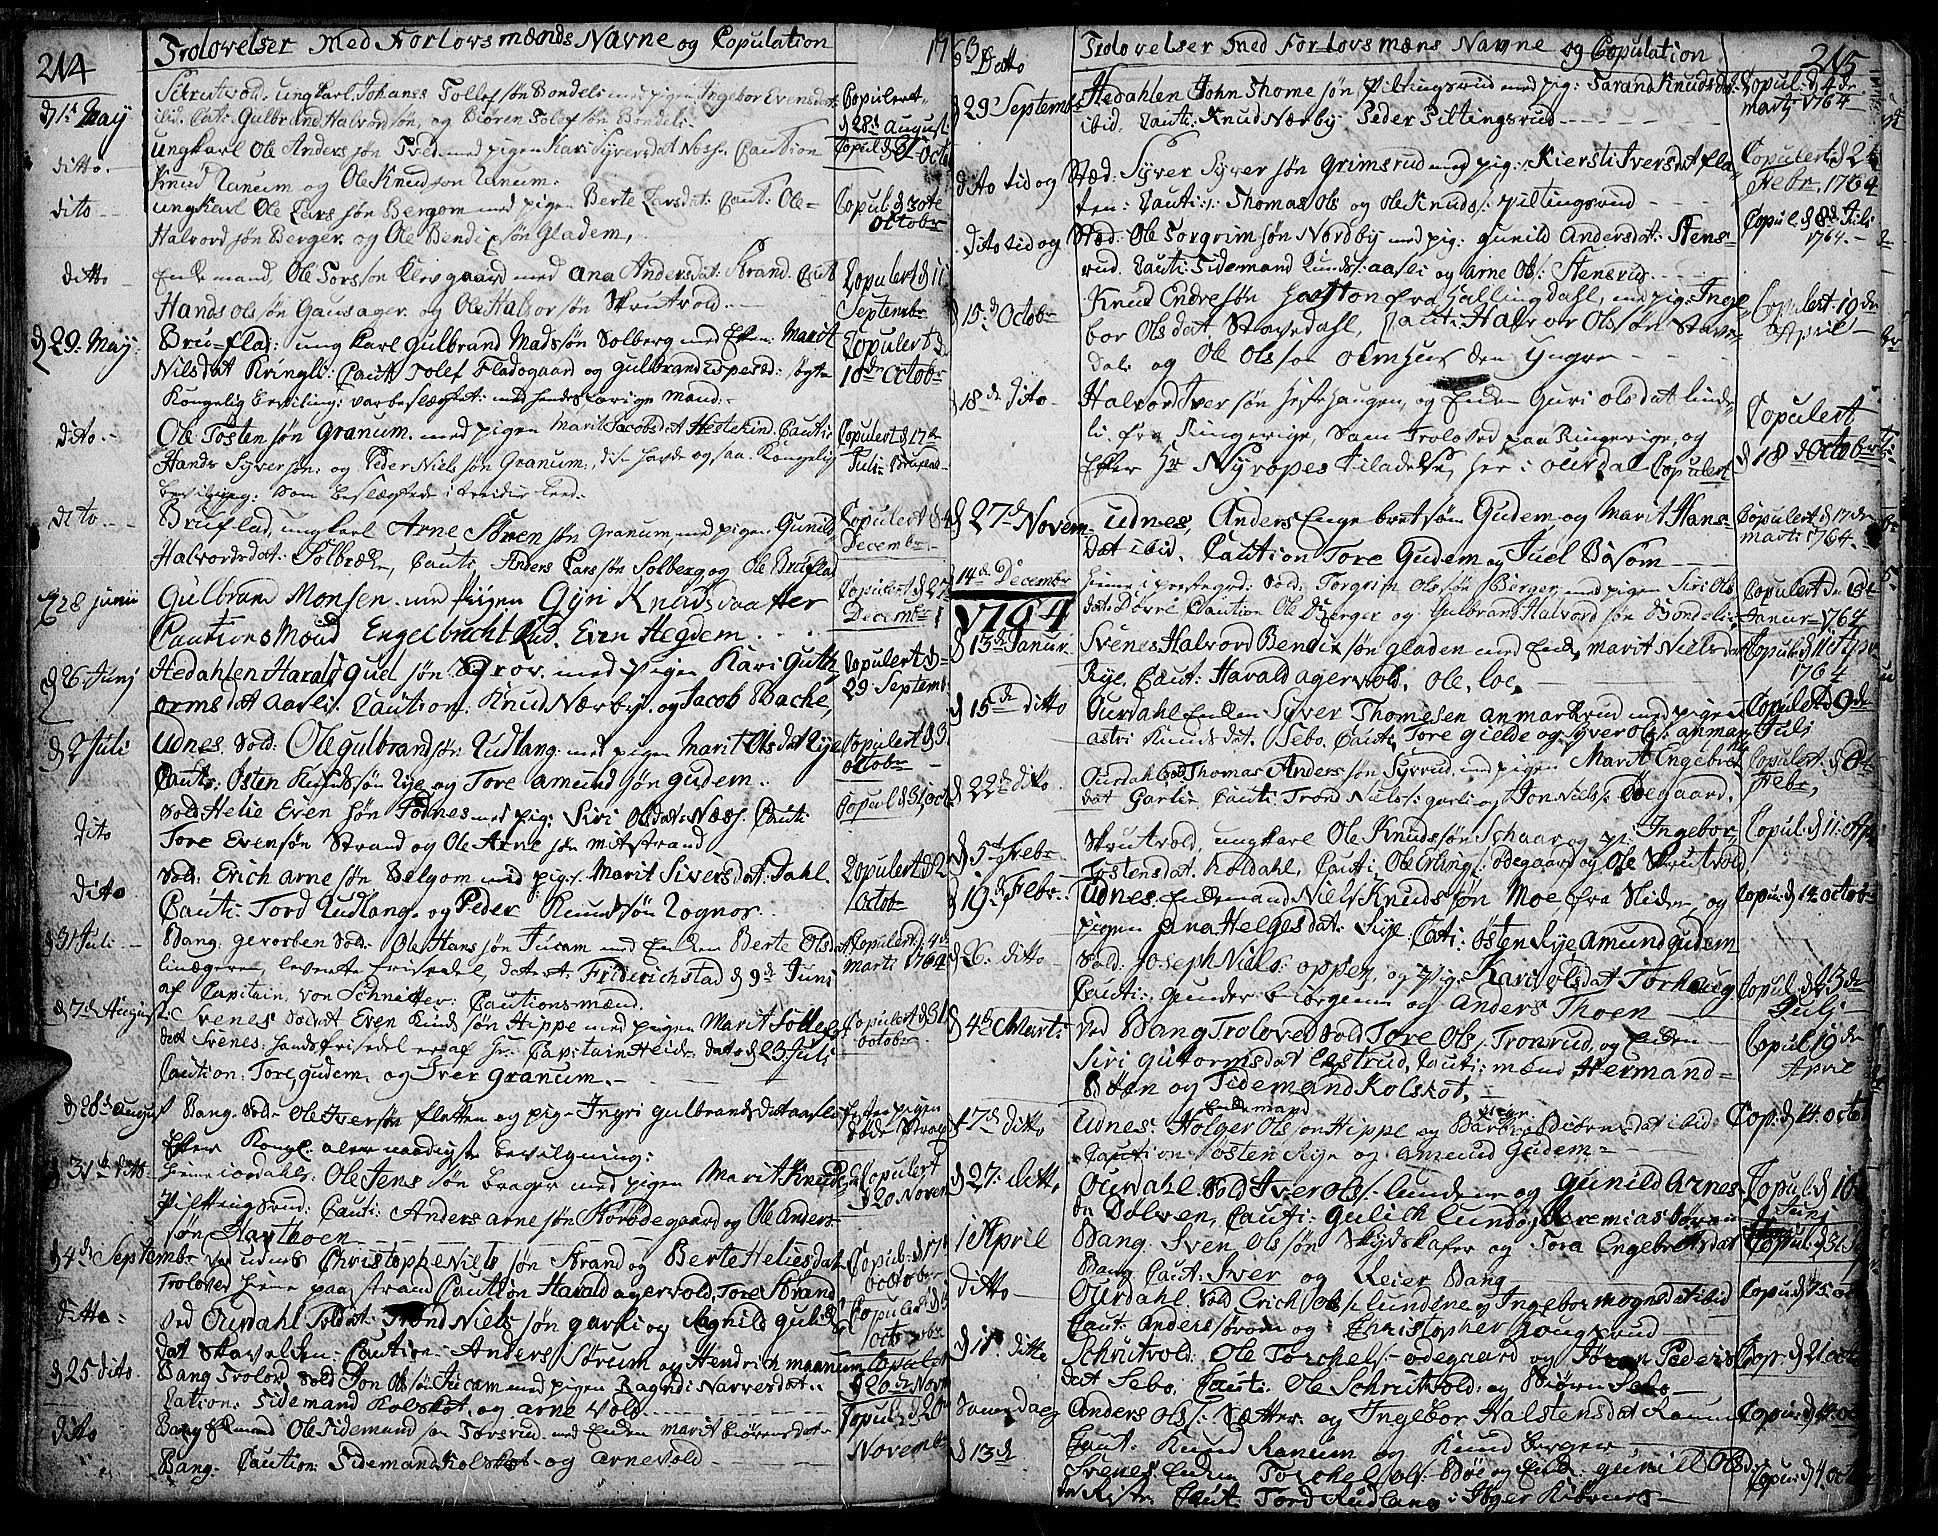 SAH, Aurdal prestekontor, Ministerialbok nr. 5, 1763-1781, s. 214-215